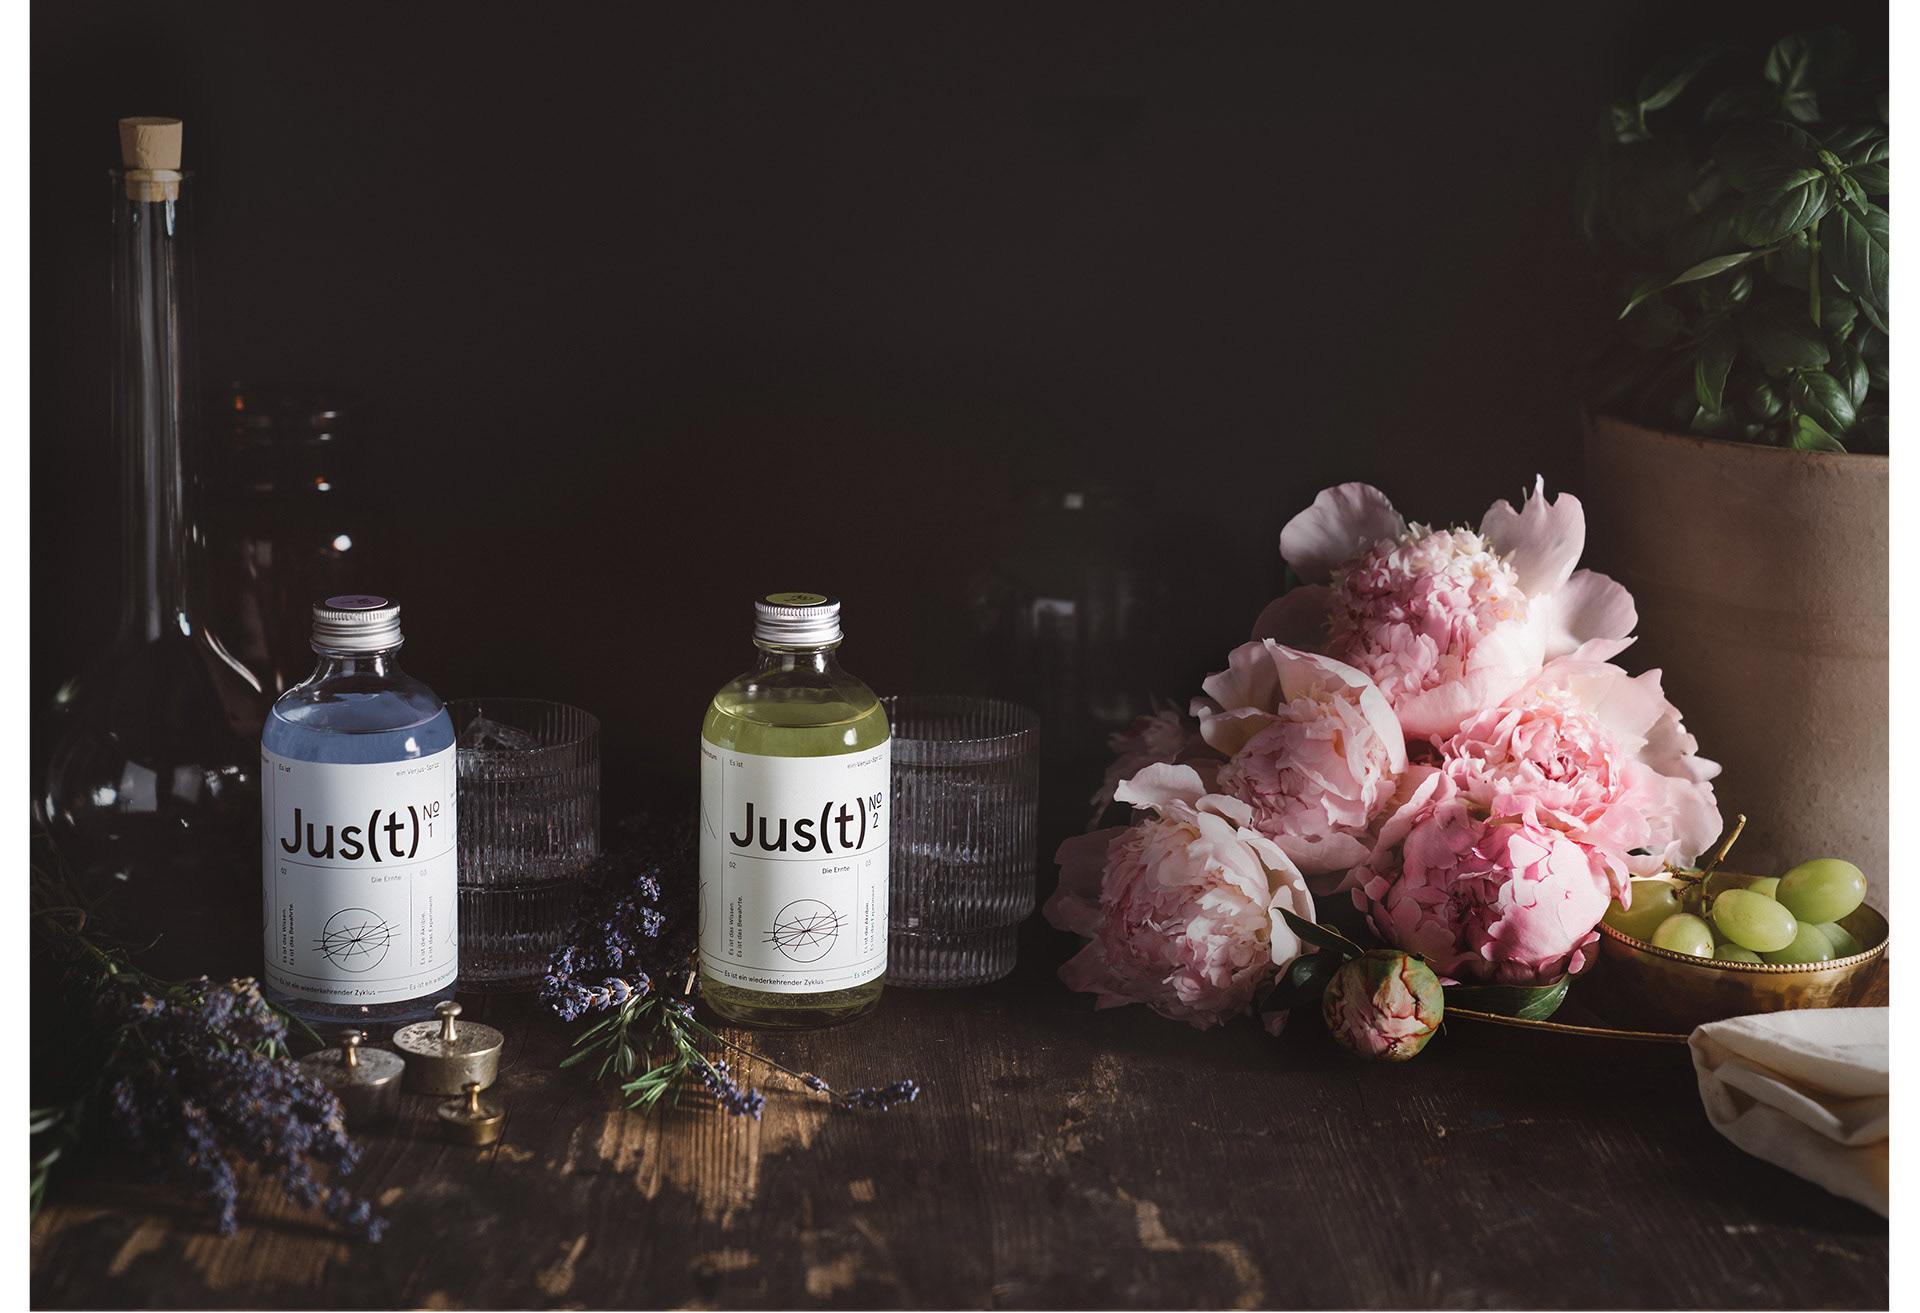 Contemporary Branding for a New Austrian Verjus Sprizz – Jus(t) by KR8 Bureau